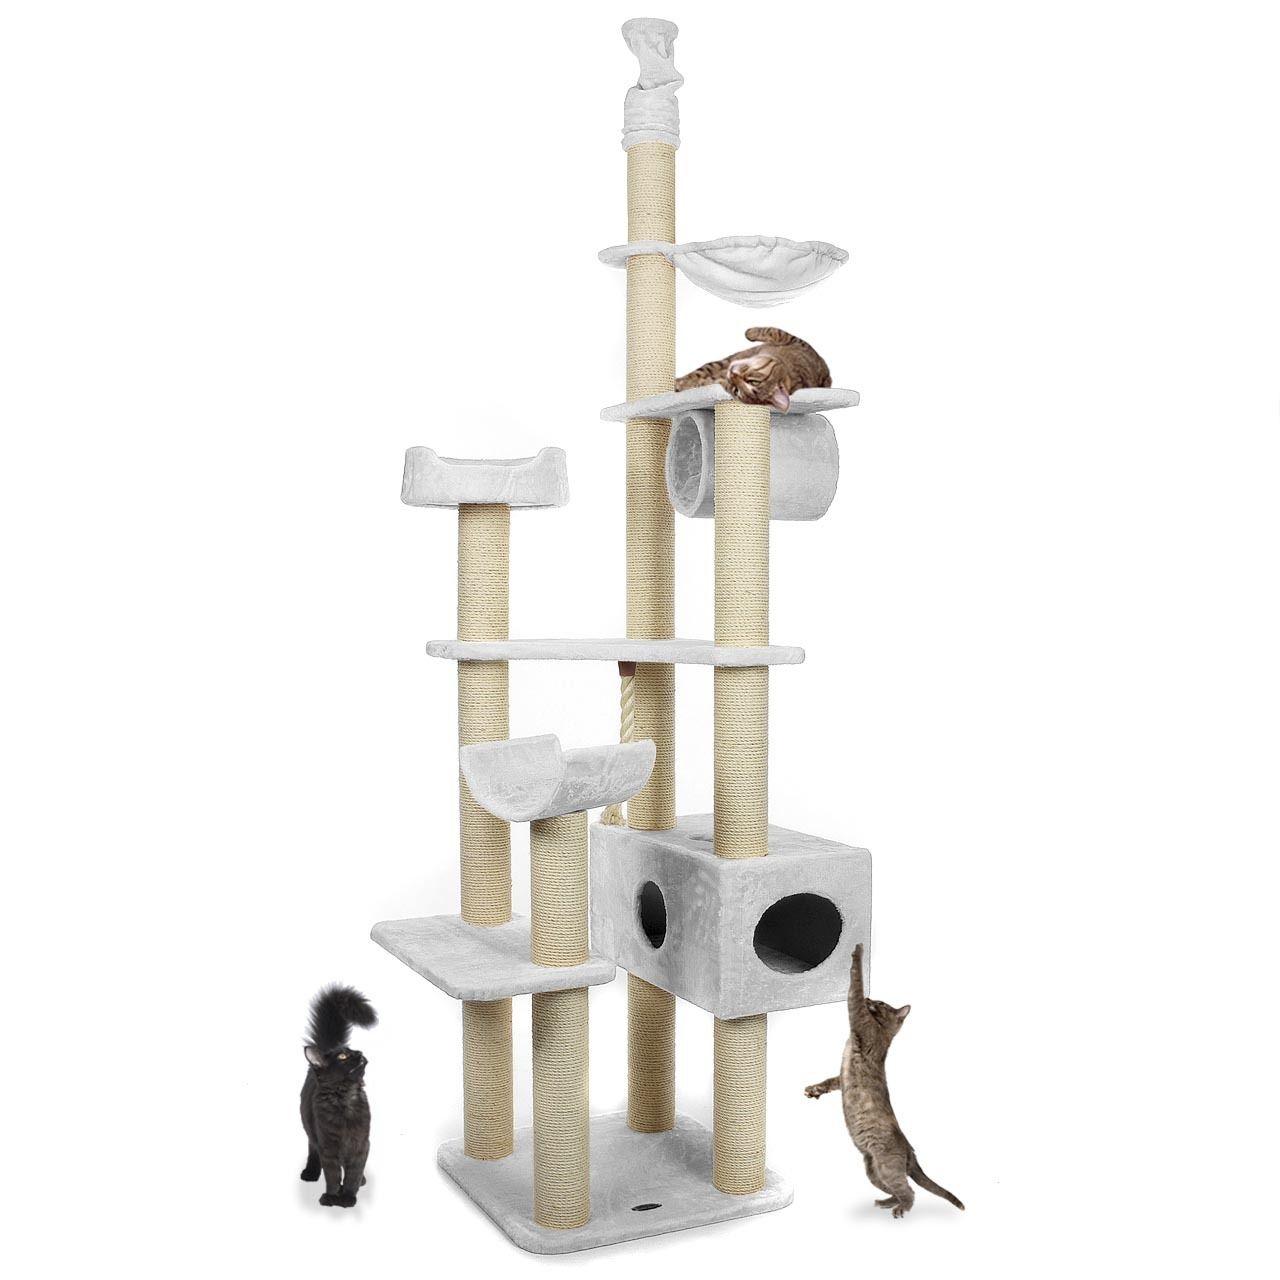 Kočičí škrábadlo XXL - bílé 230cm - 260cm vysoké